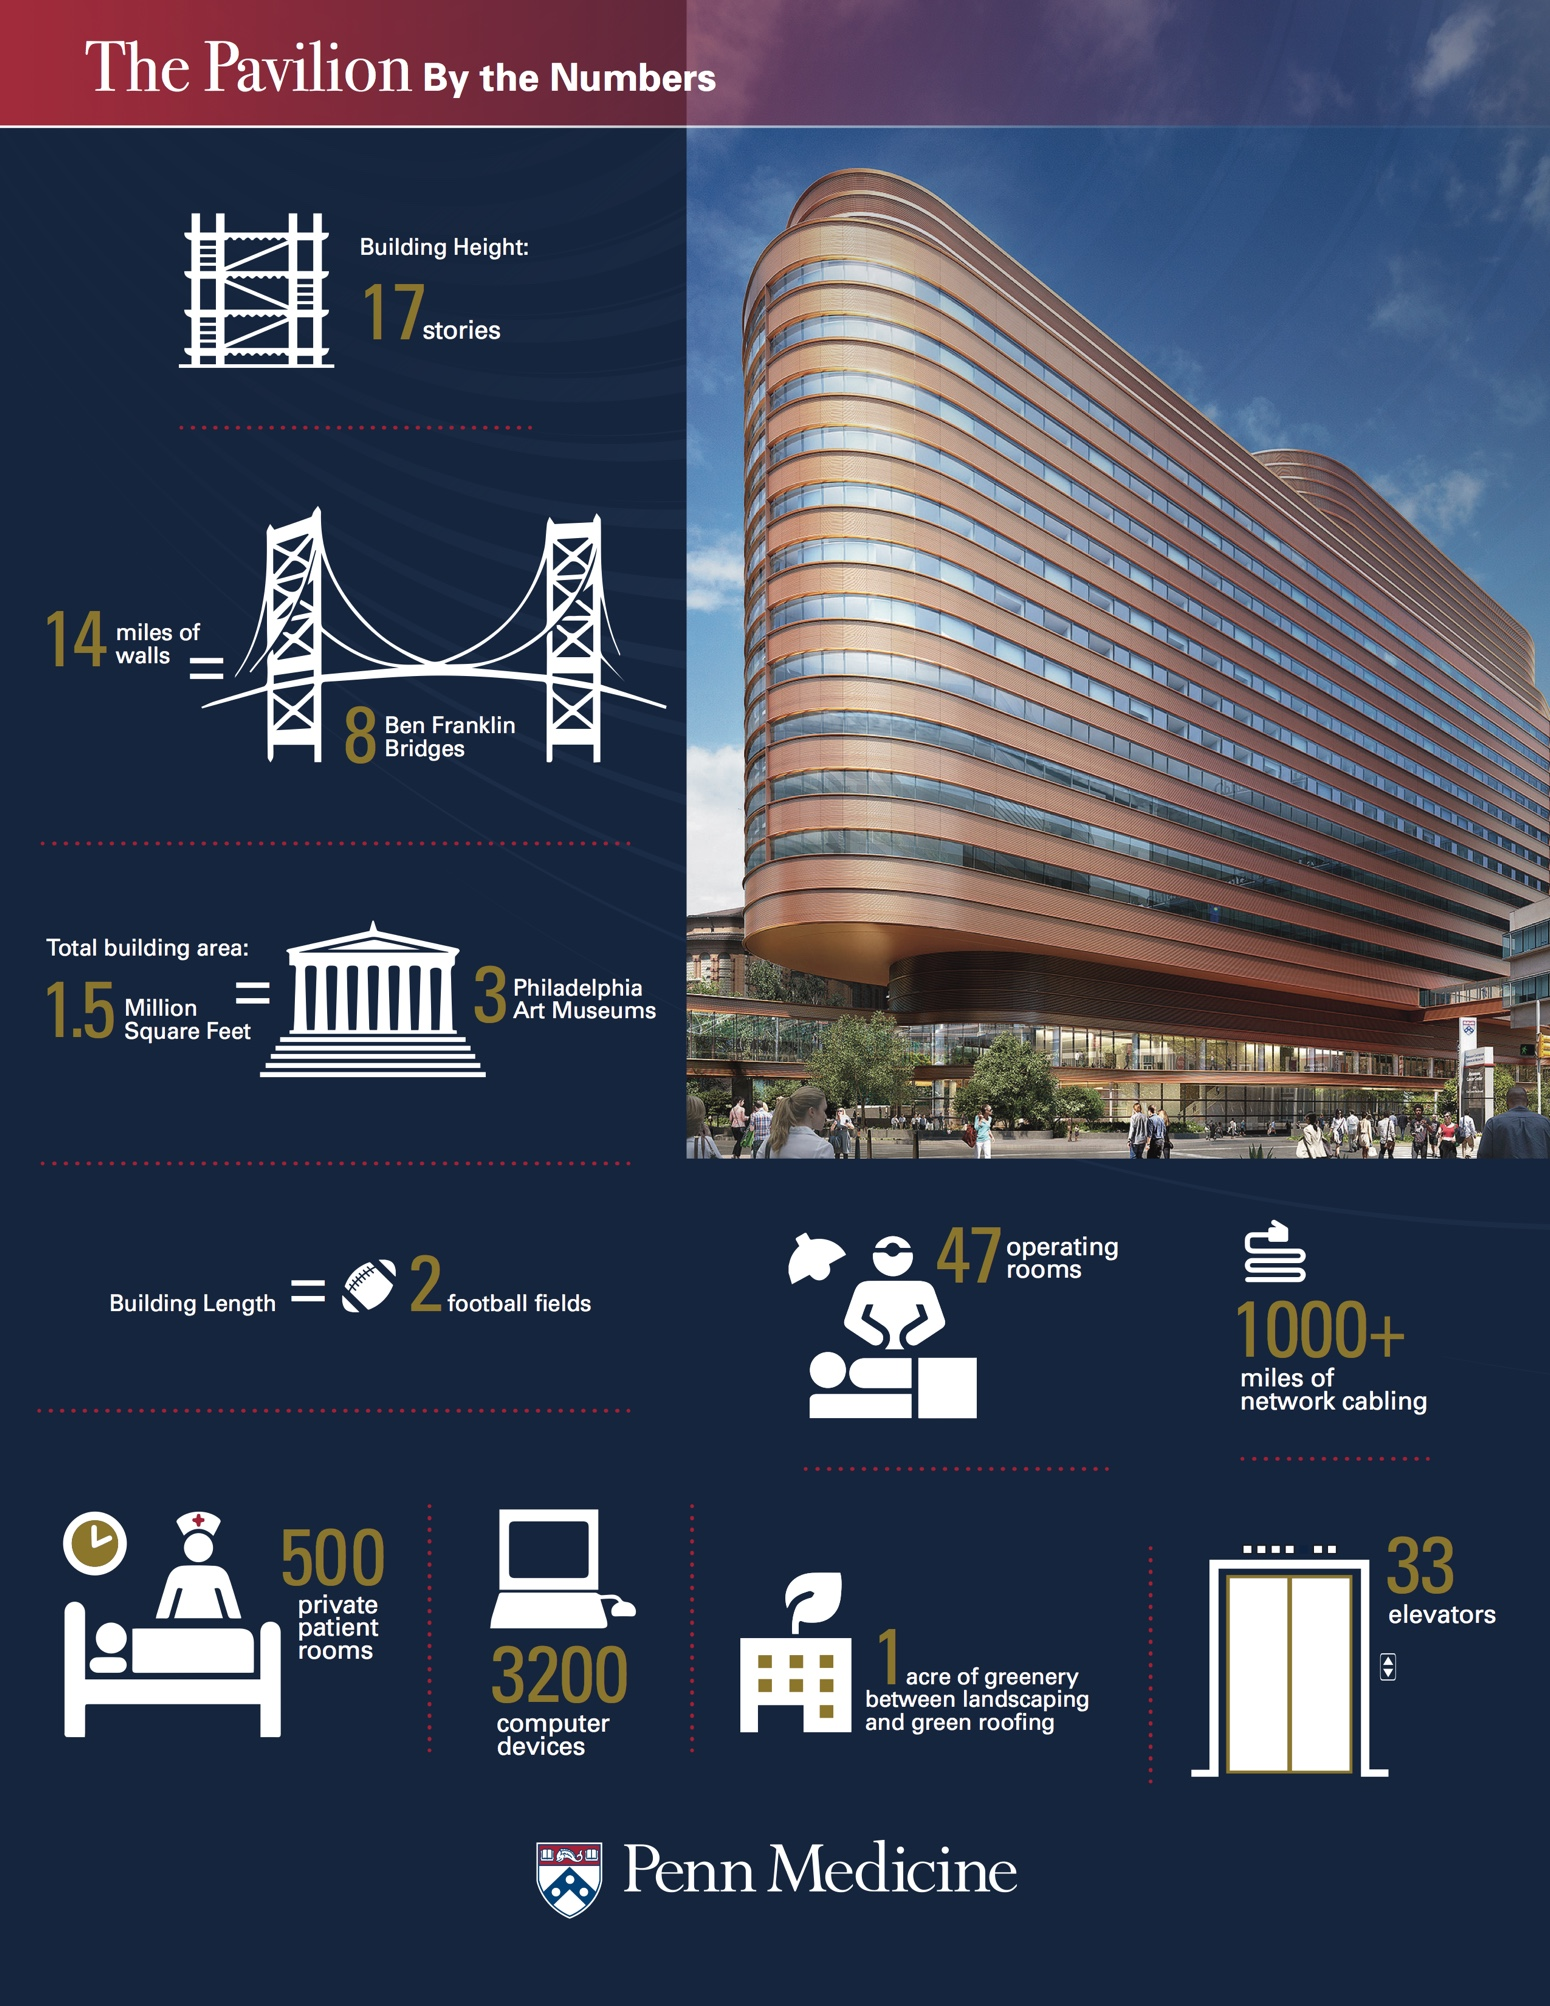 Pavilion infographic courtesy of Penn Hospital.